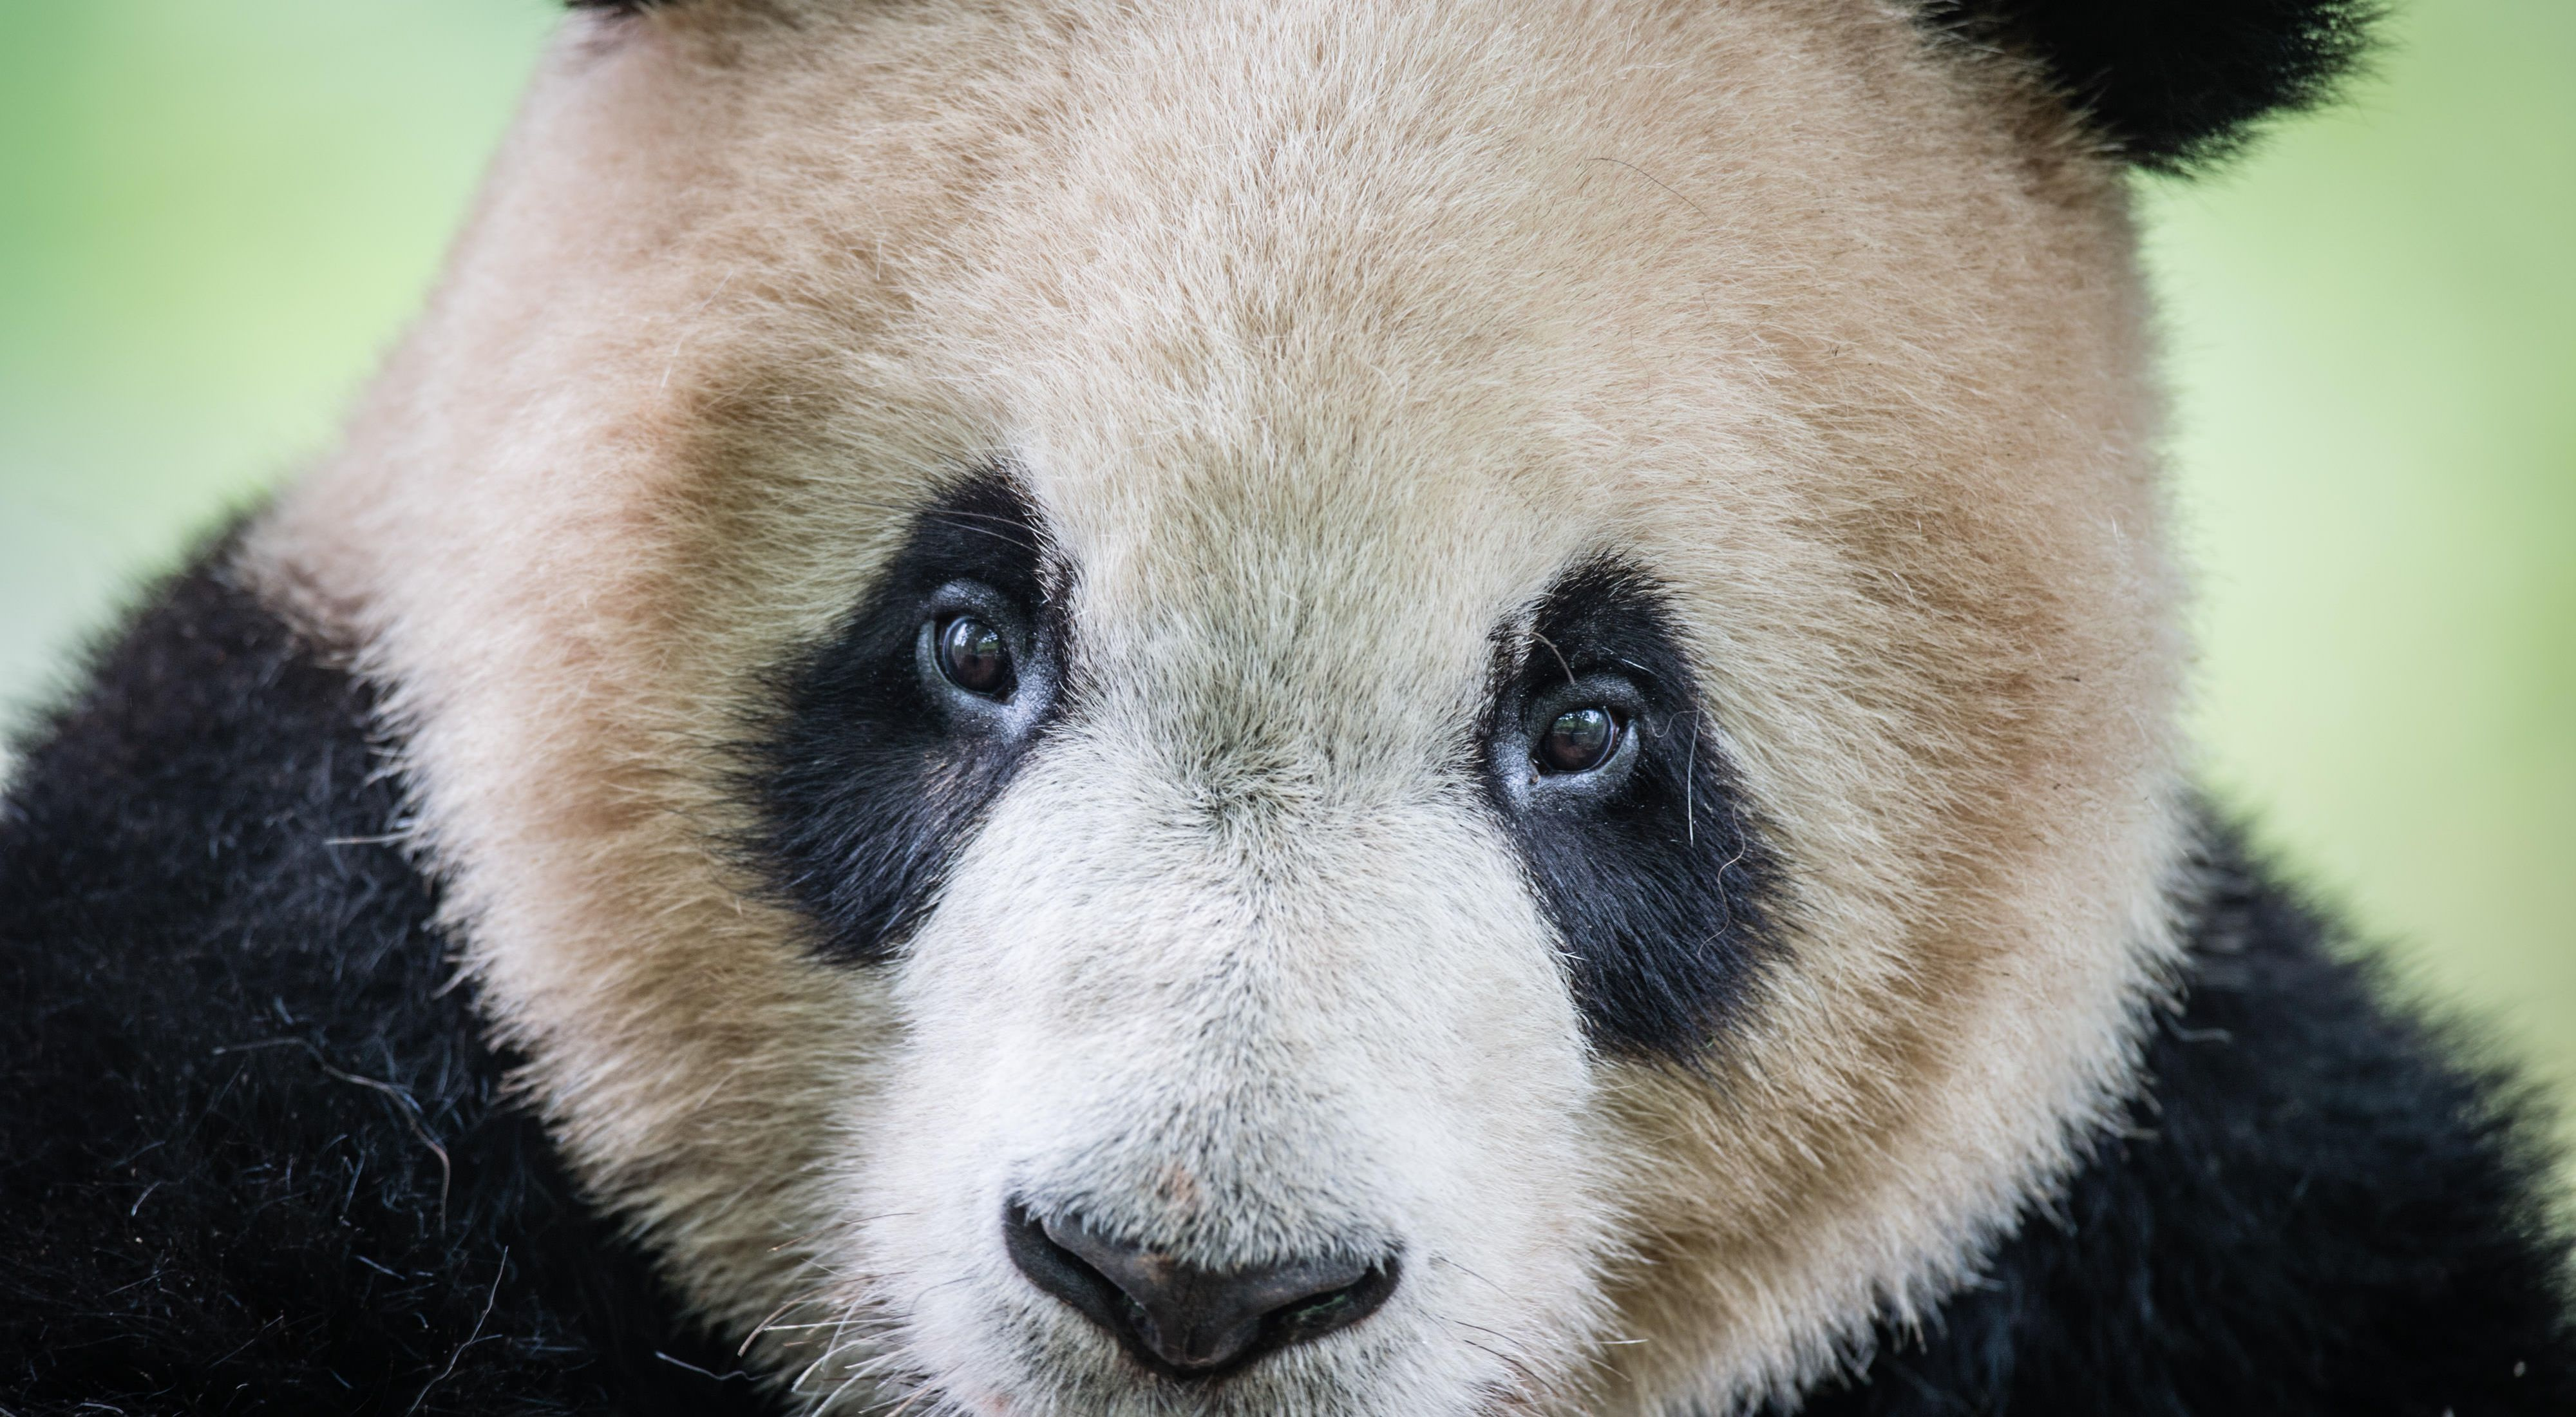 at the Dujiangyan Panda Base outside of Chengdu in Sichuan Province, China.